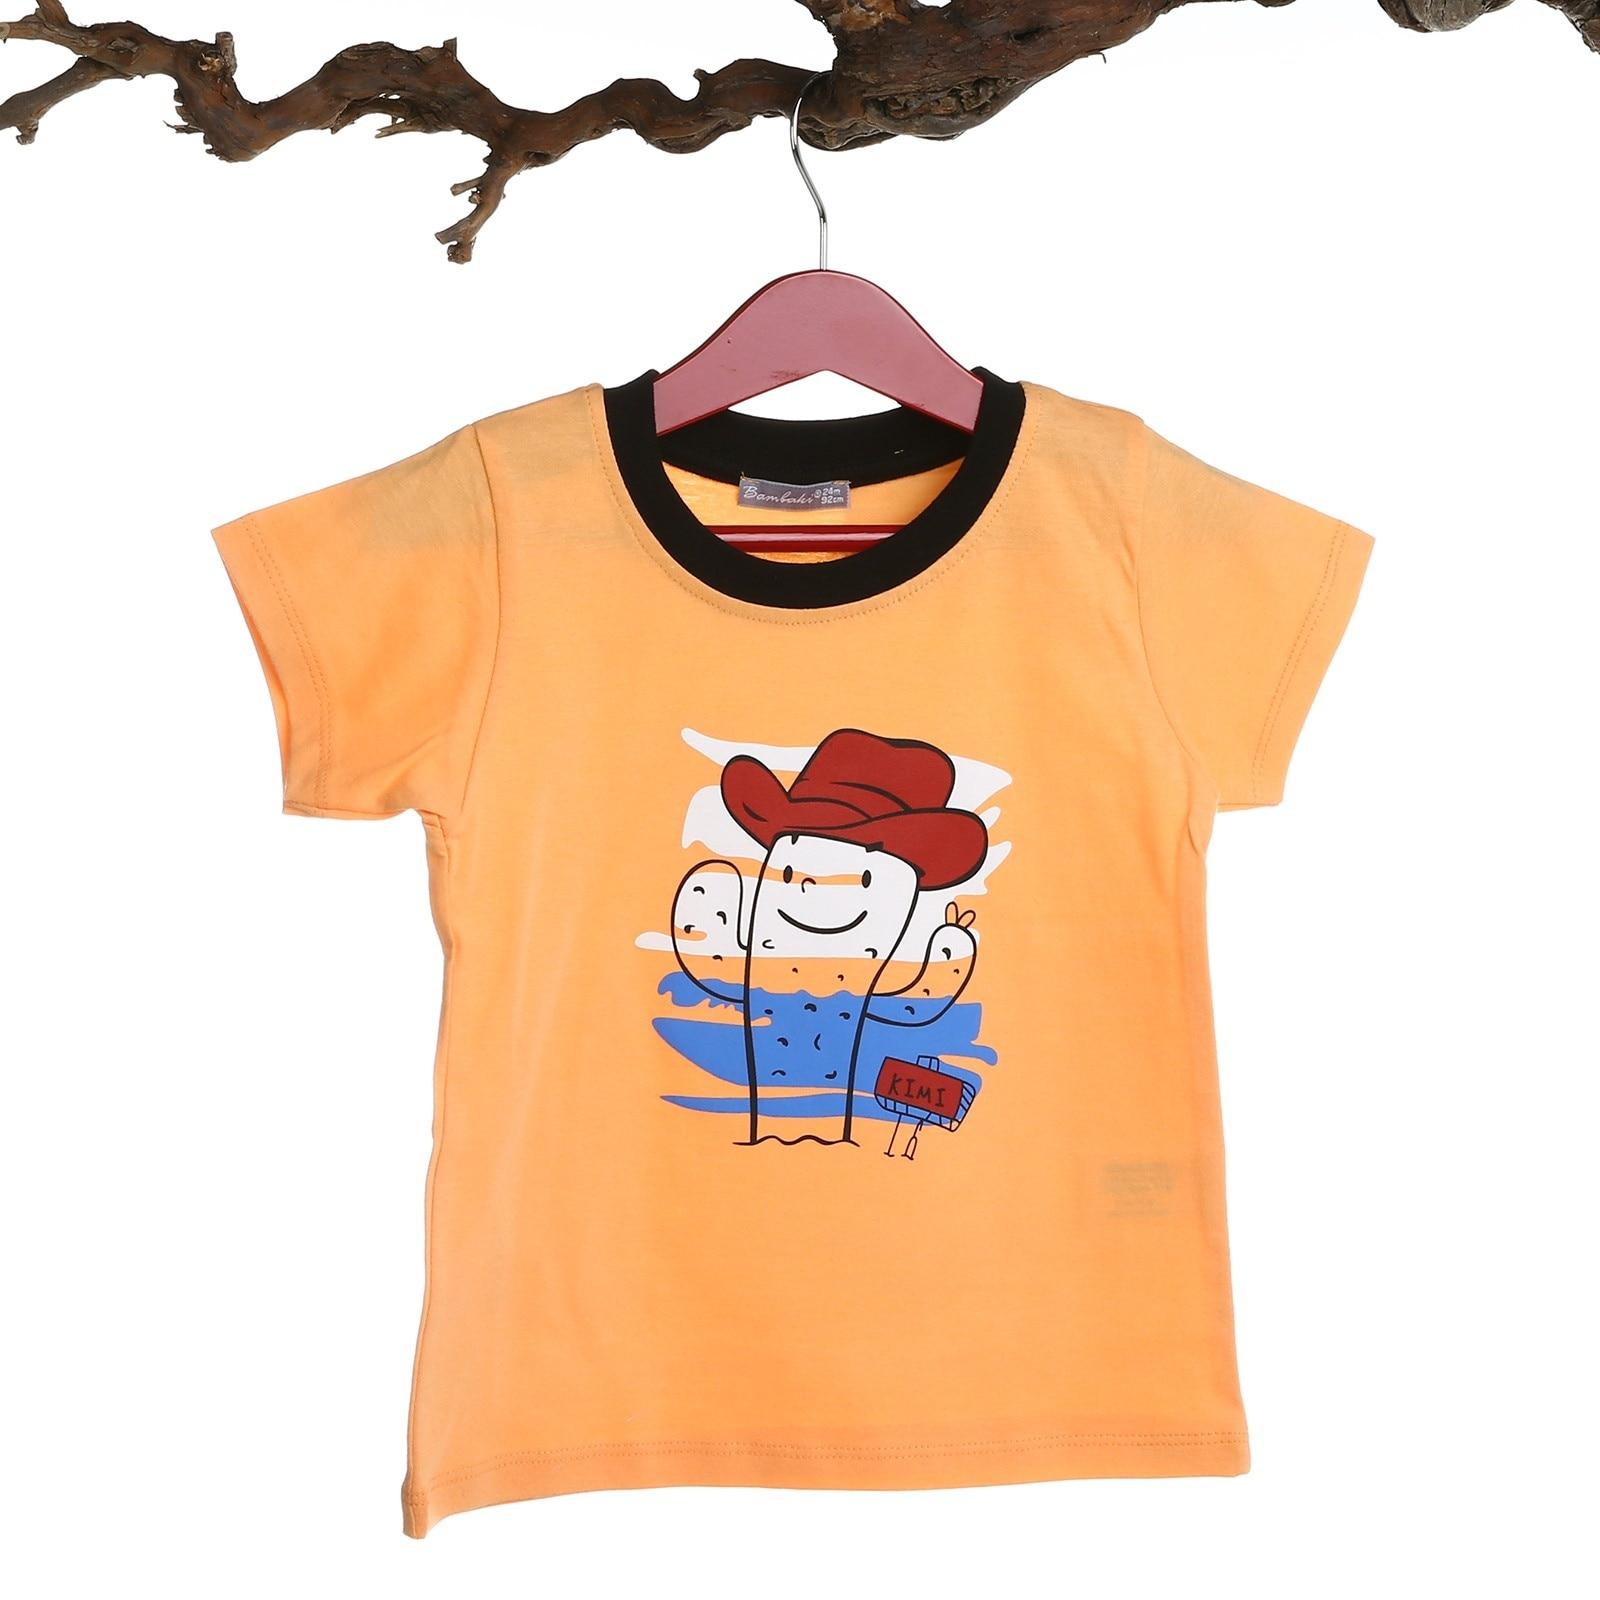 Ebebek Bambaki Printed Tshirt